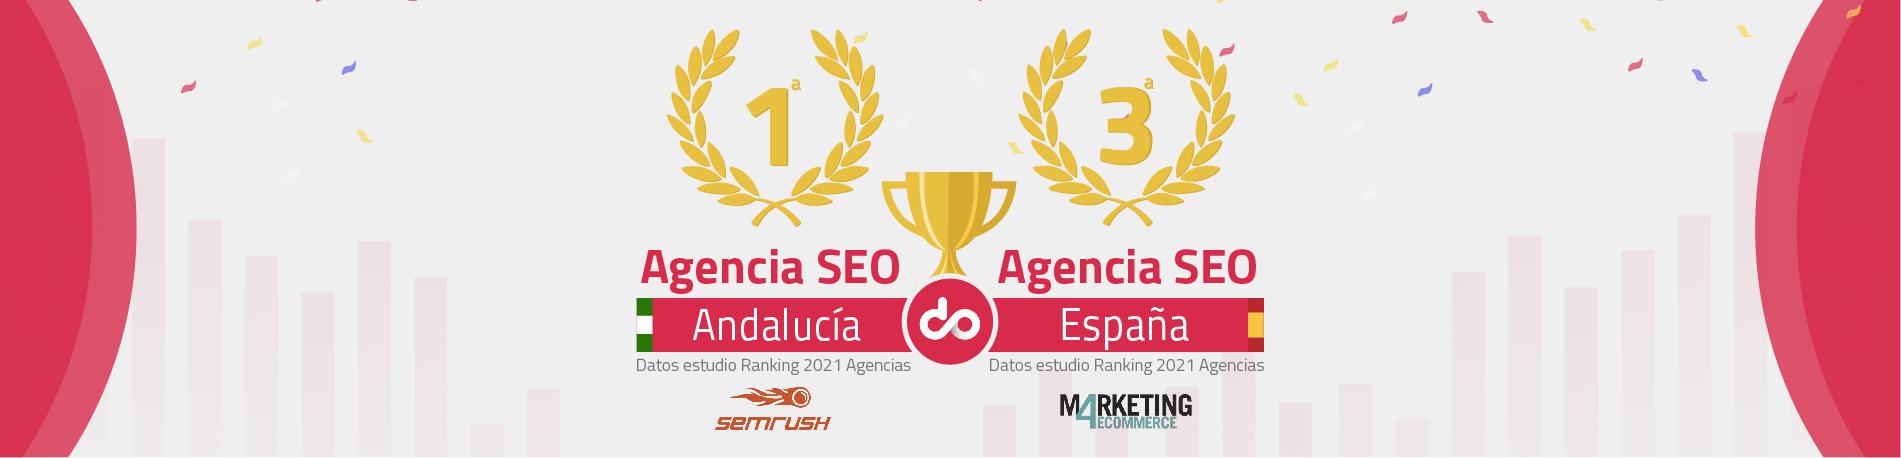 Agencia SEO Valencia